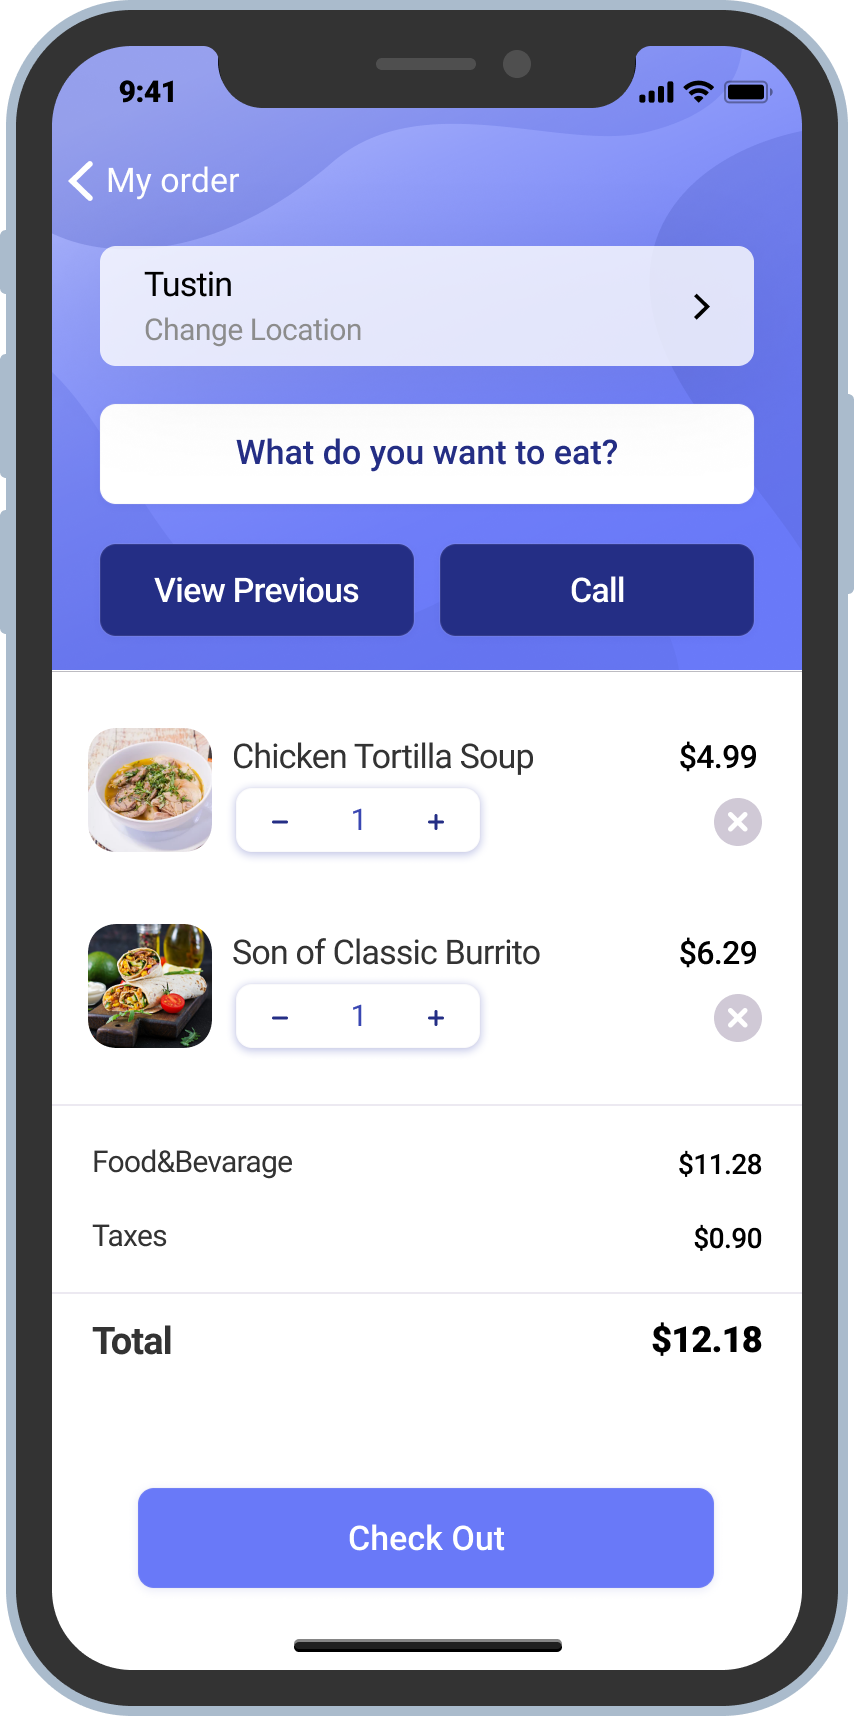 Restaurant mobile app development by Belitsoft experts